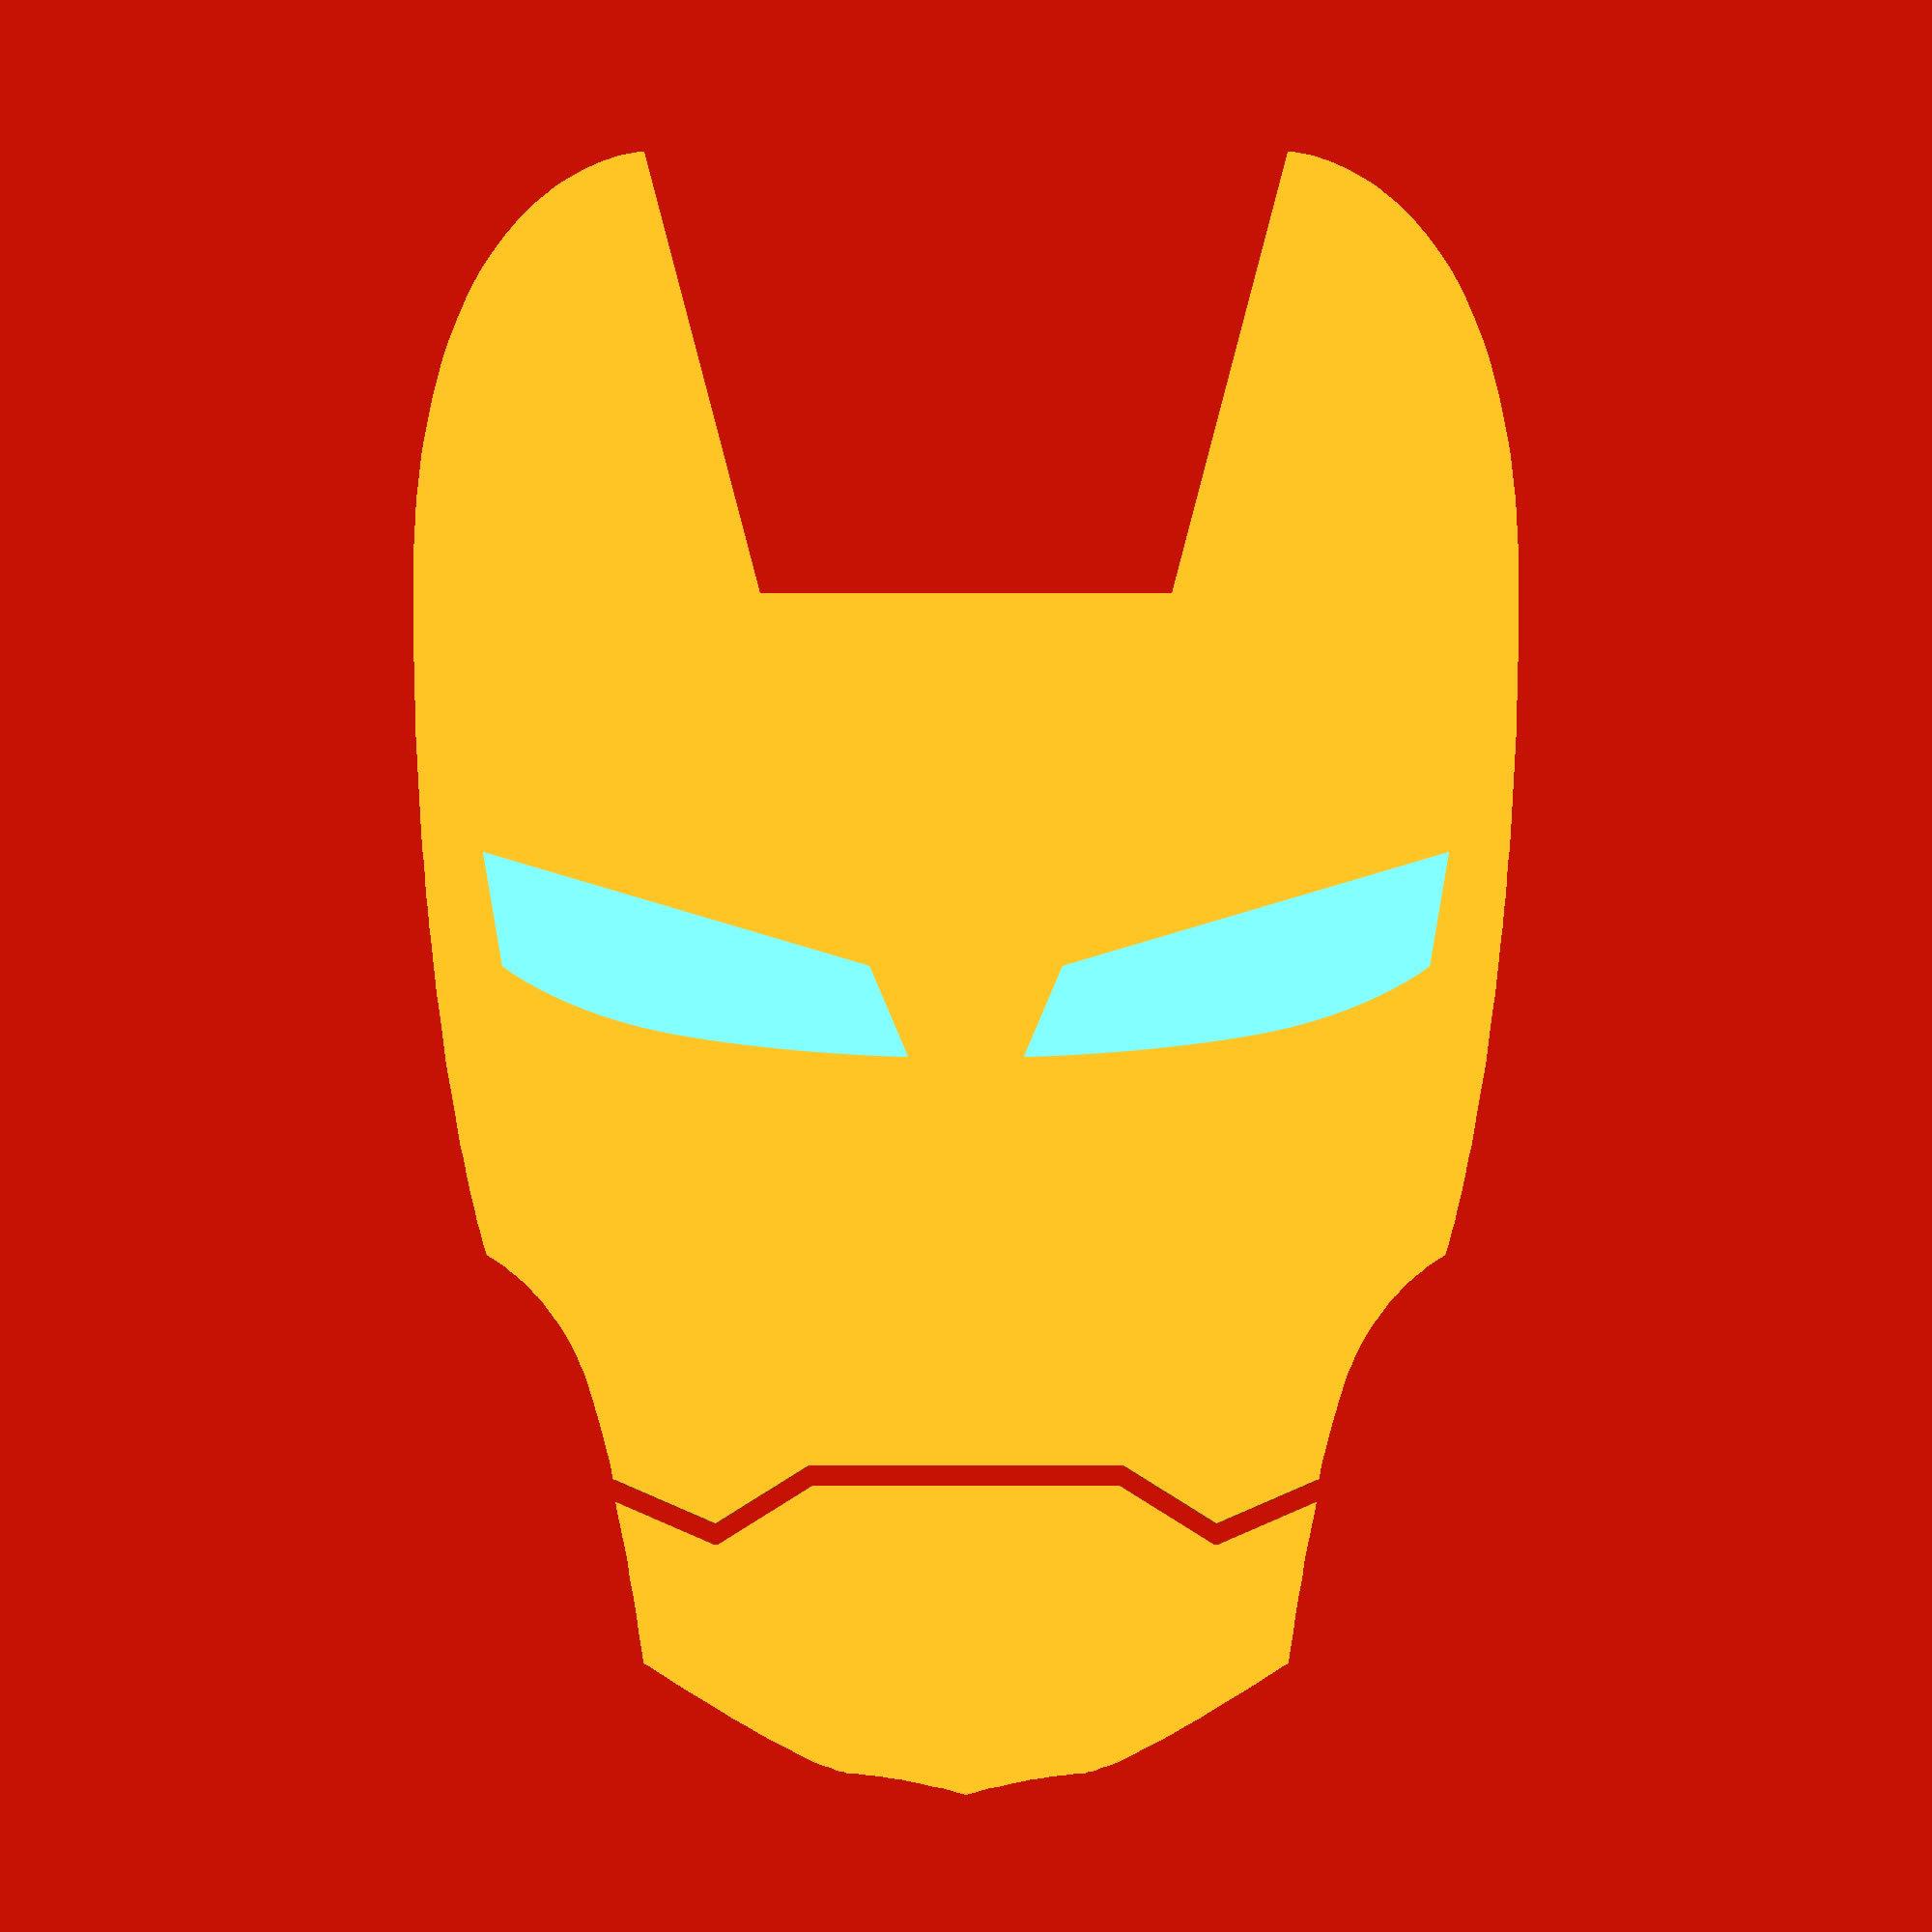 Logo clipart iron man  on Superhero IRON Techhead55